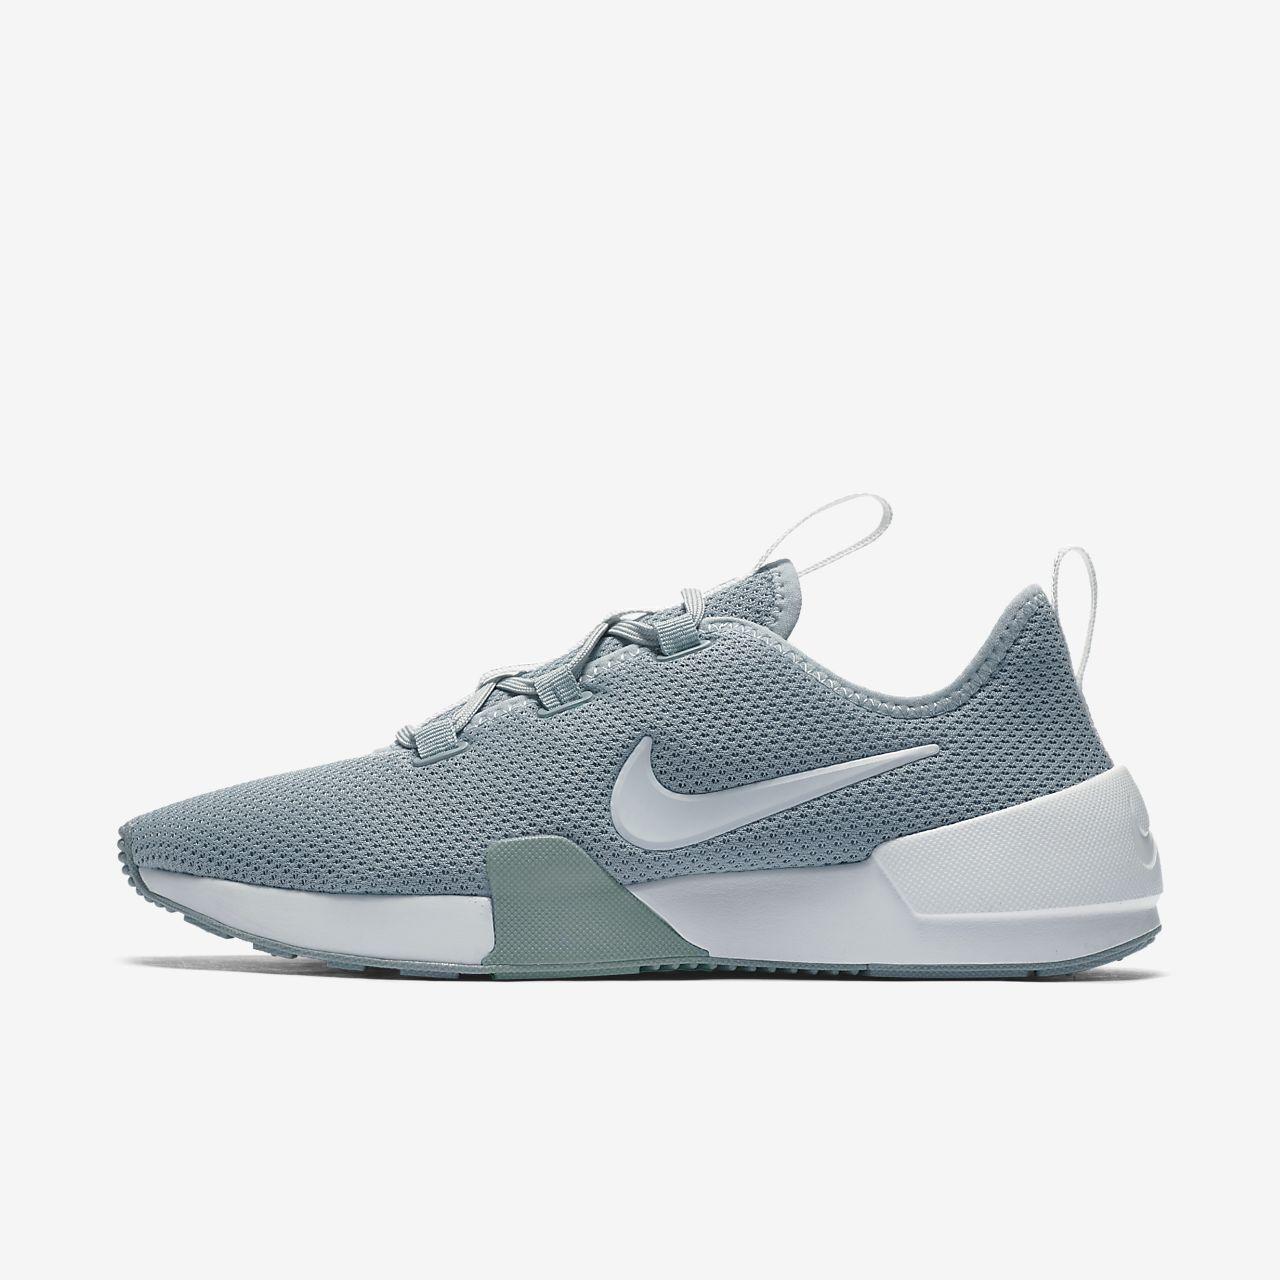 b92c5530187 Calzado para mujer Nike Ashin Modern Run. Nike.com CL